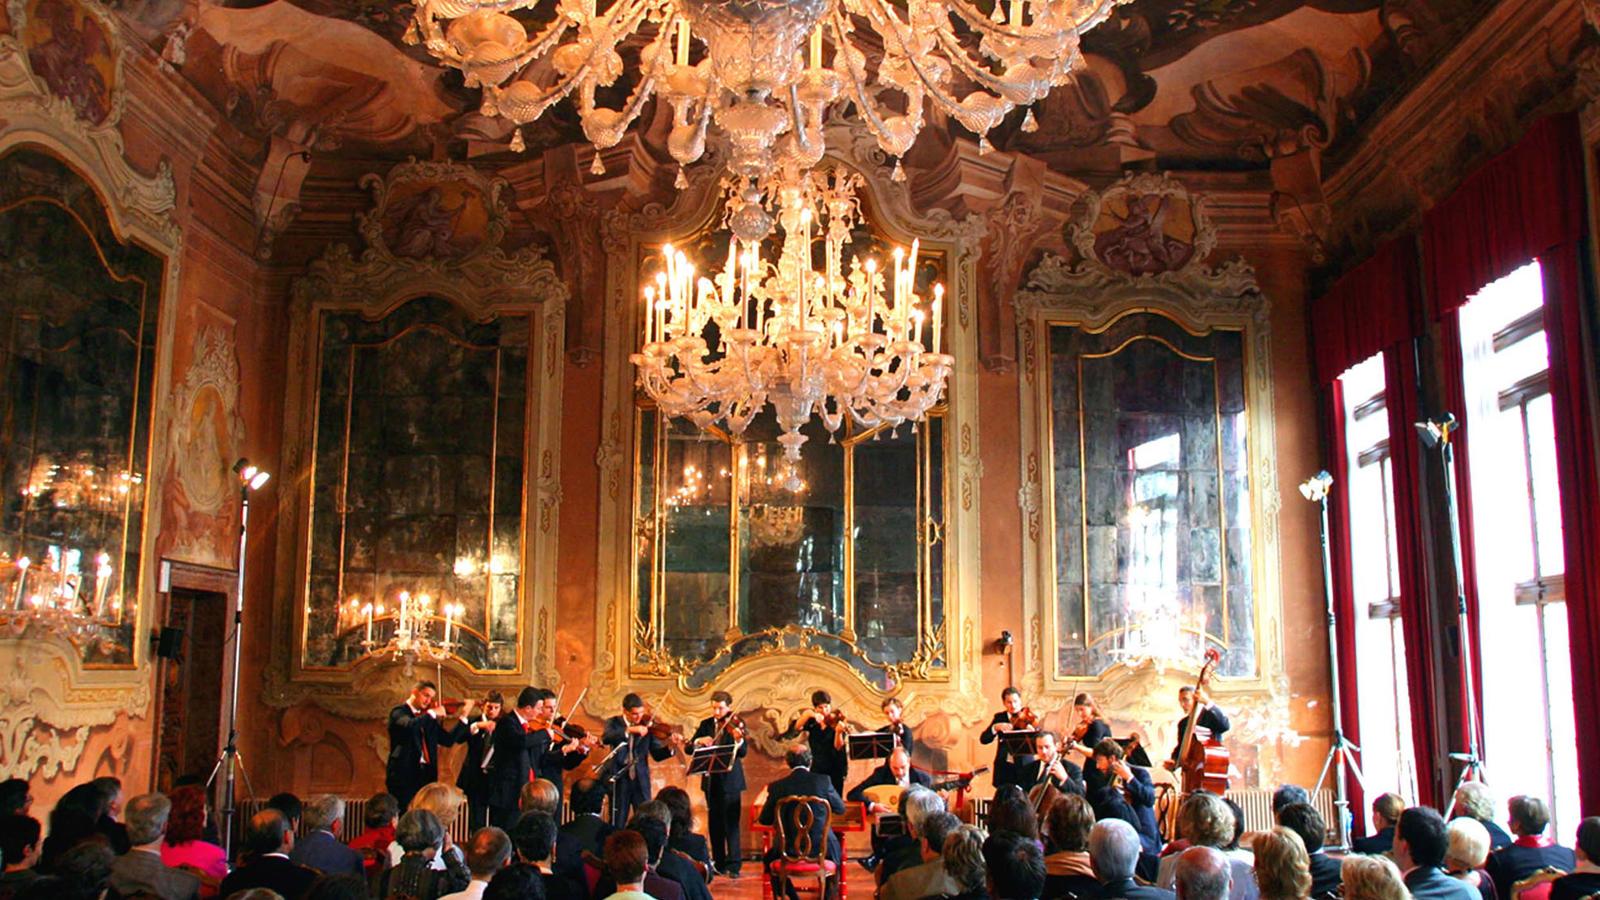 baroque oratorio - photo #10